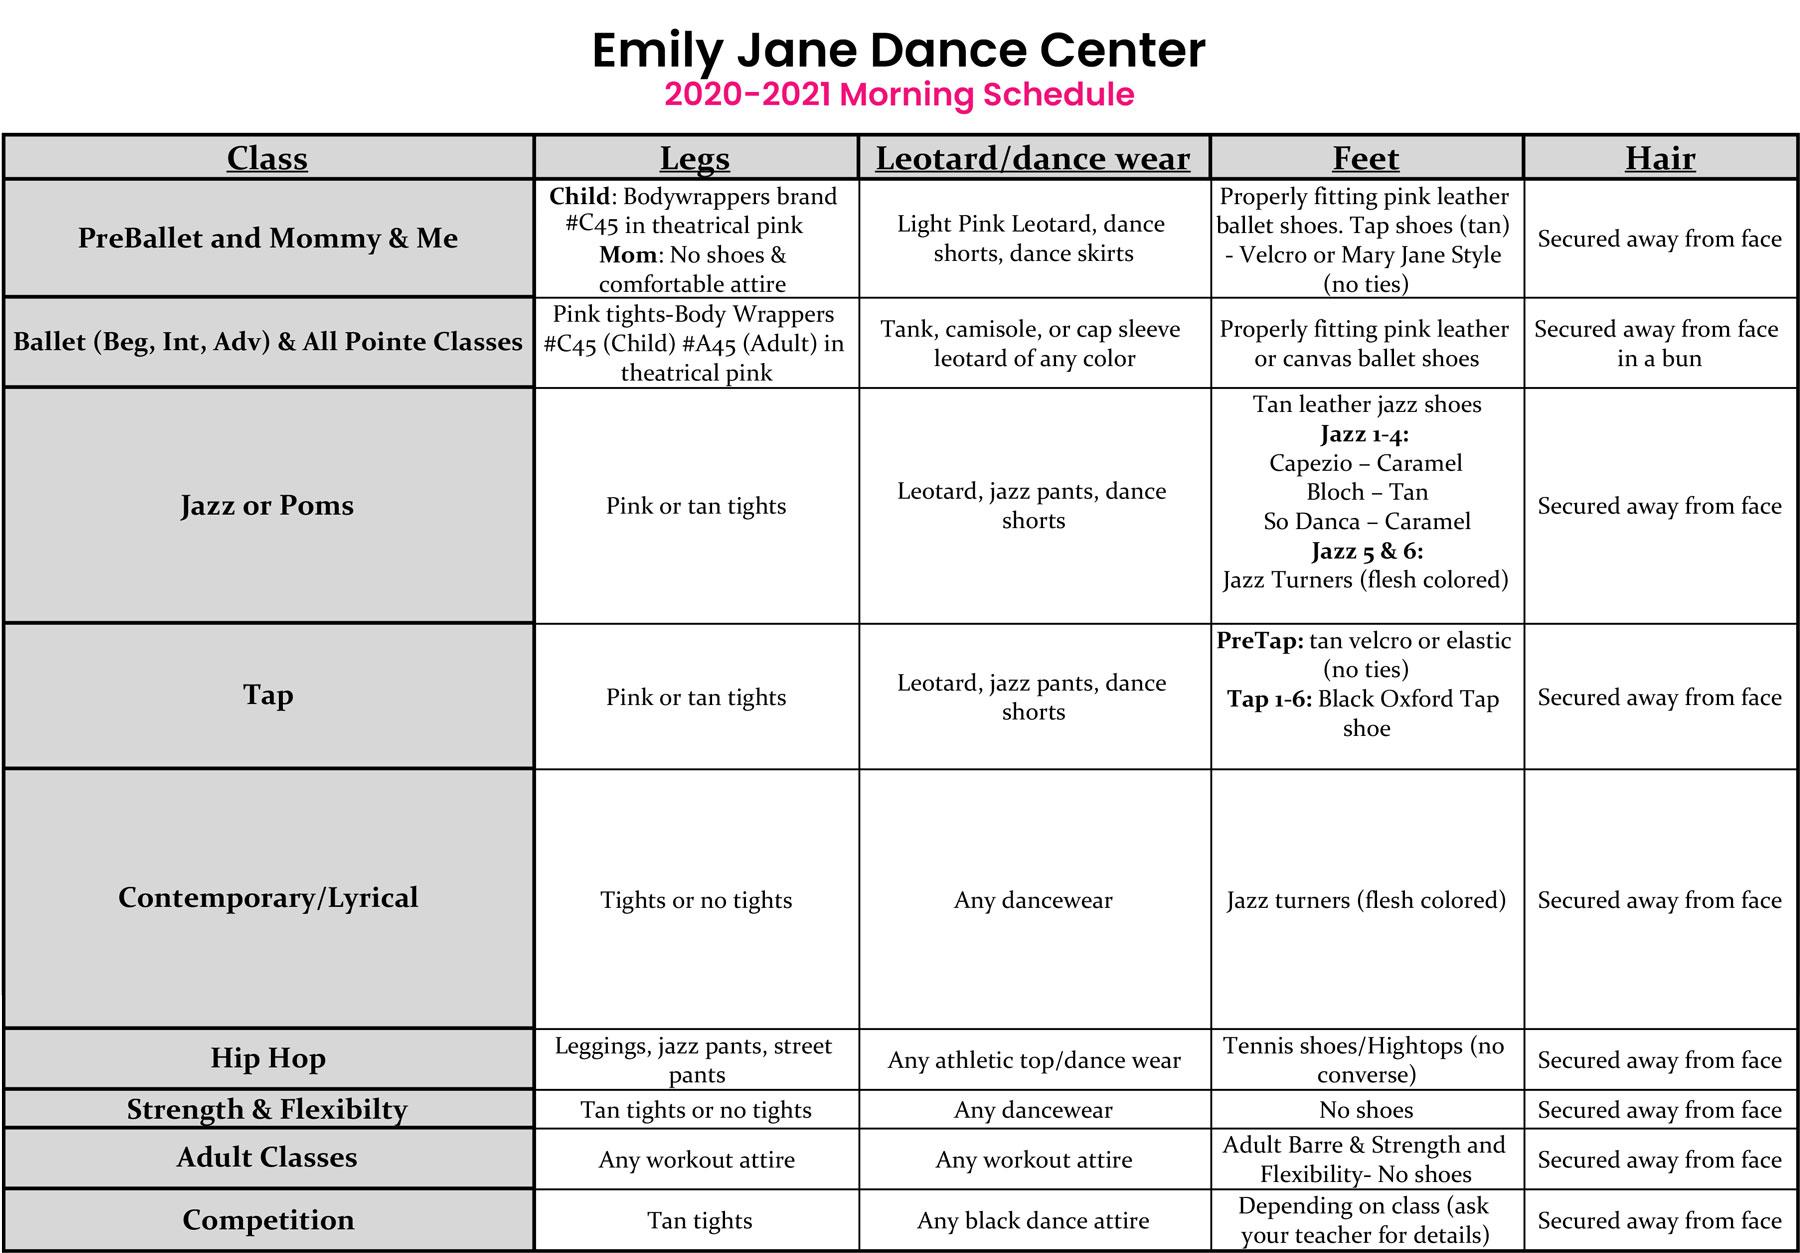 Dress code for dance studio classes in St. Louis